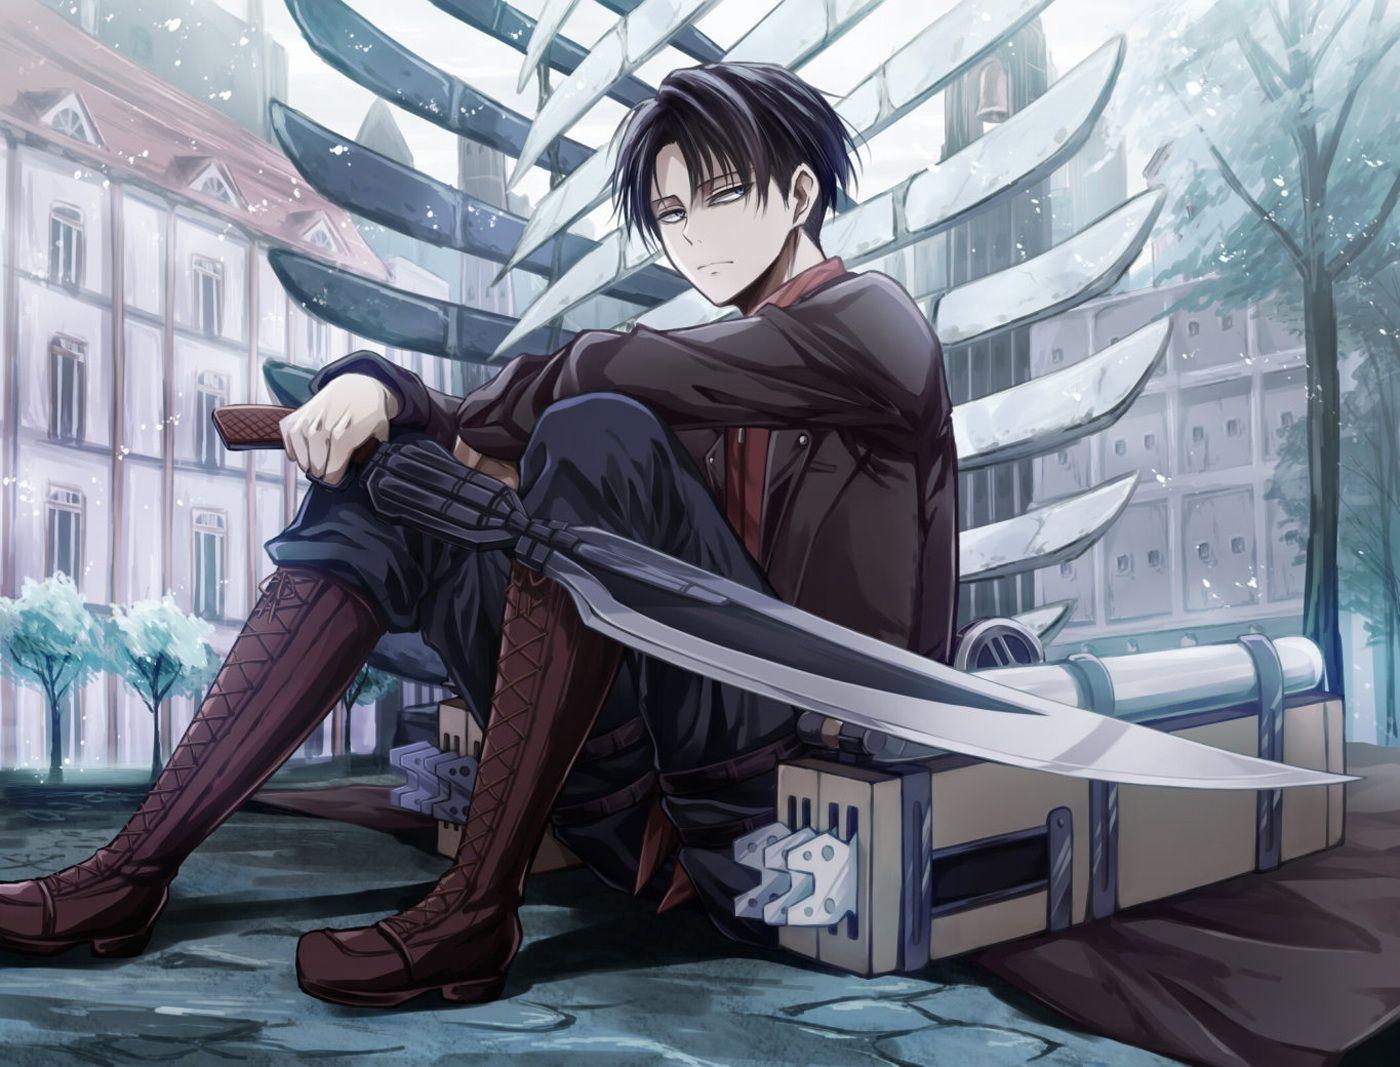 Levi 'Rivaille' (Shingeki no Kyojin) Fan Art: Levi~attack on titan